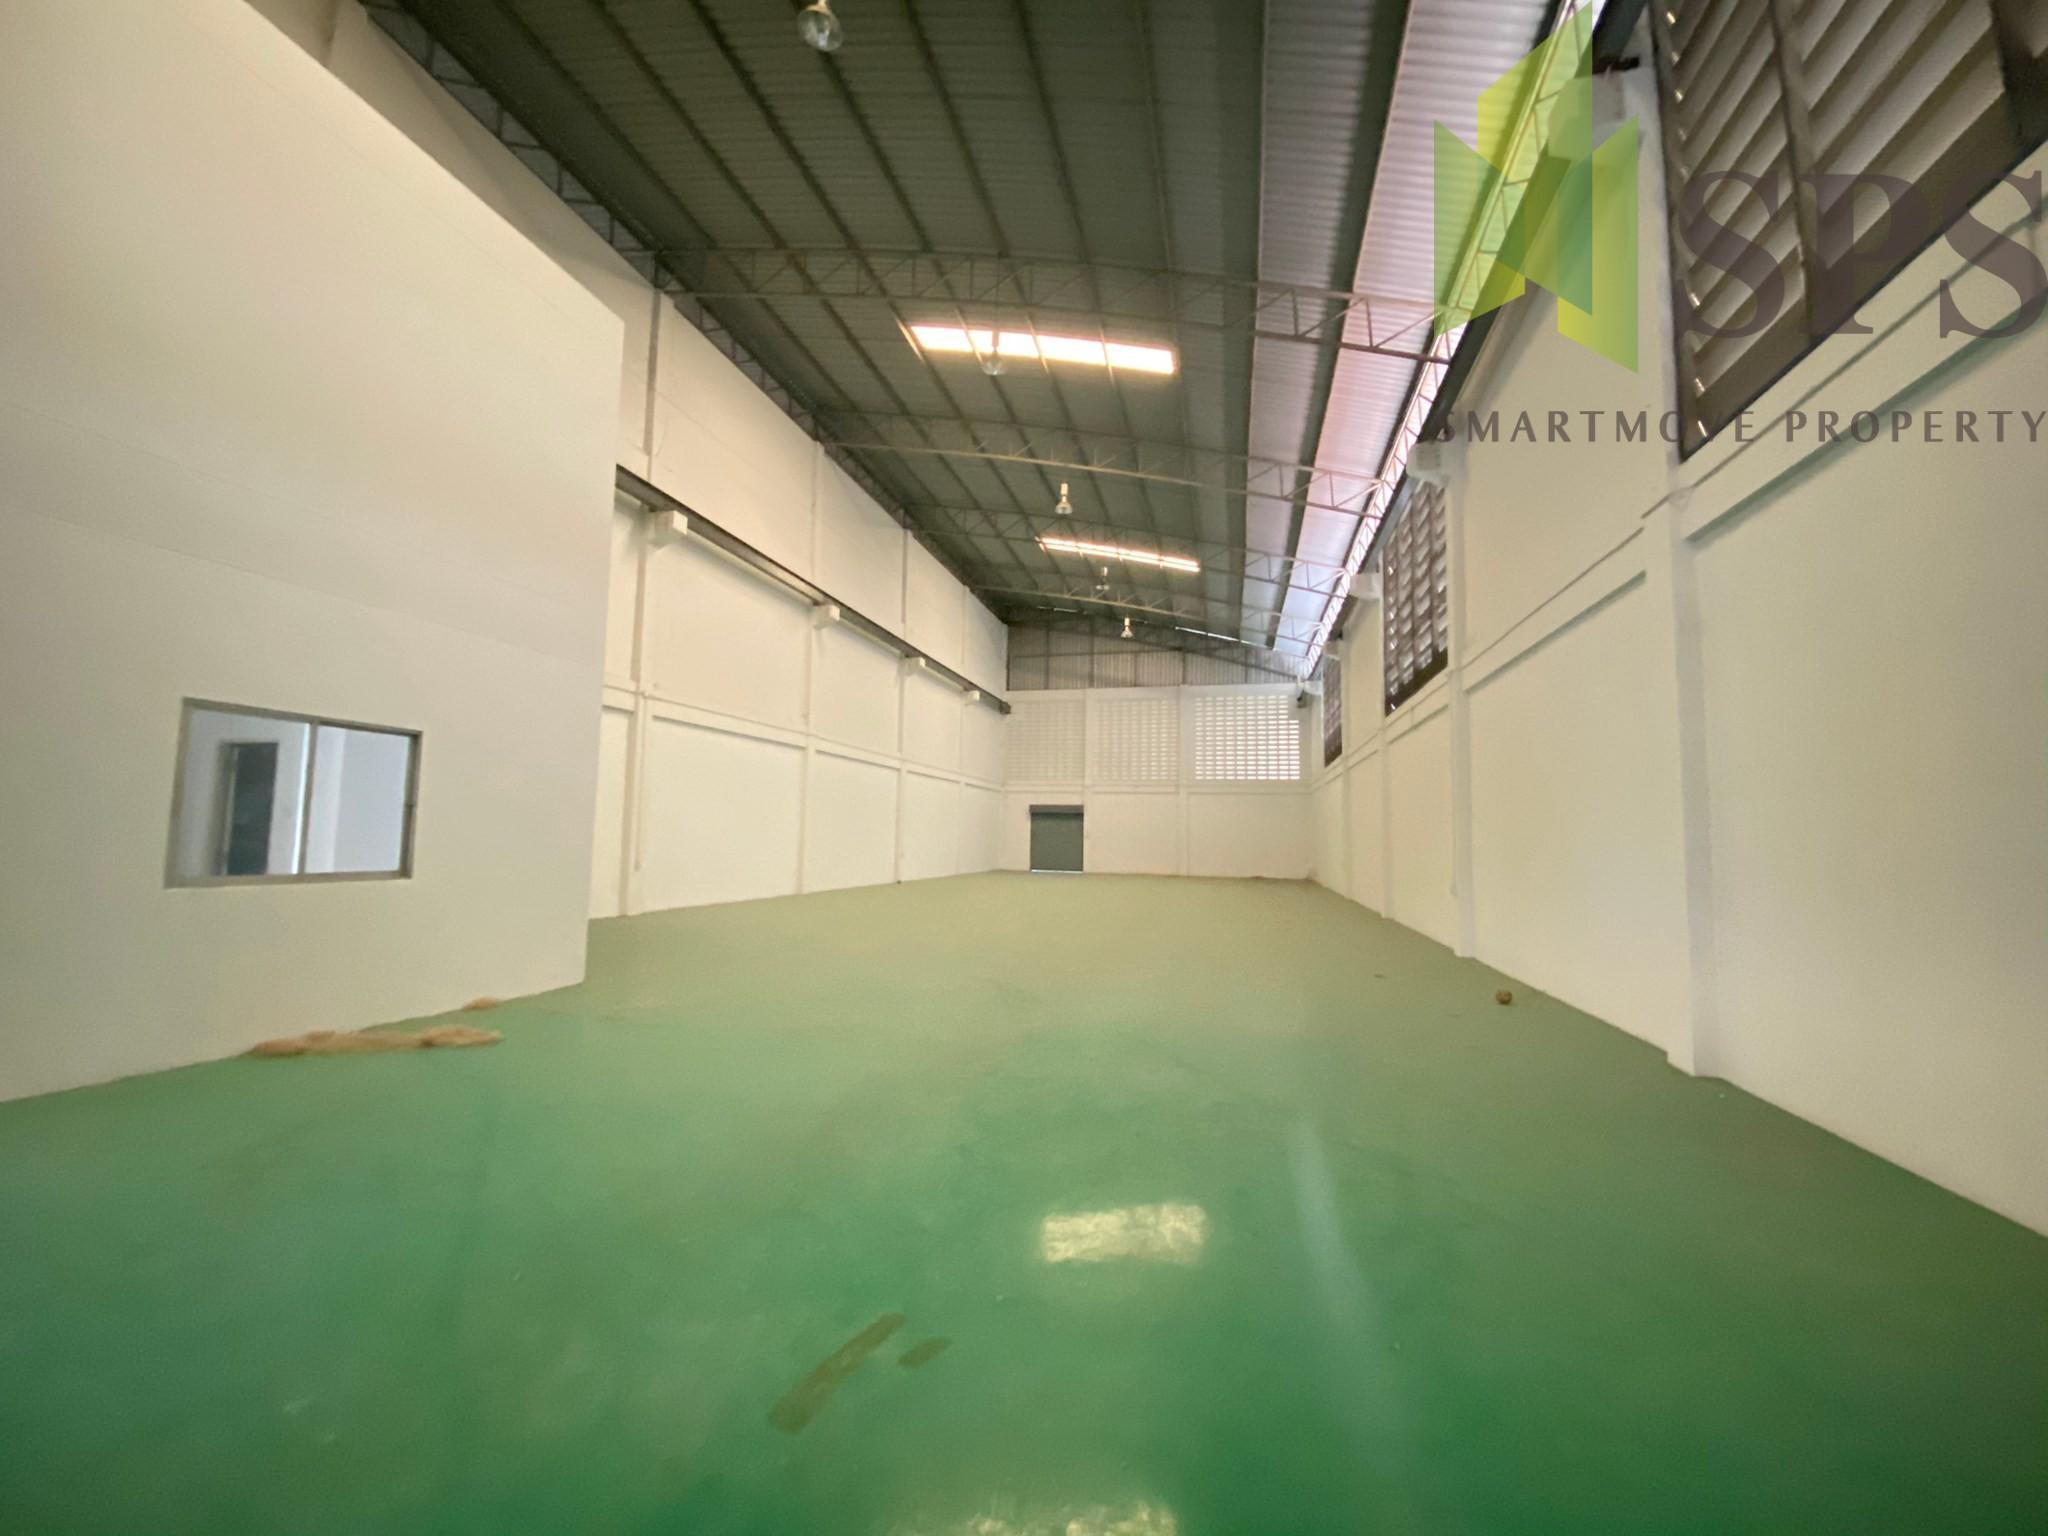 Factory, Warehouse for RENT and SELL at Bang Phli Yai, โกดัง, โรงงานให้เช่า และ ขาย ซอยยิ่งเจริญ(Property ID: SPS-PPW135)